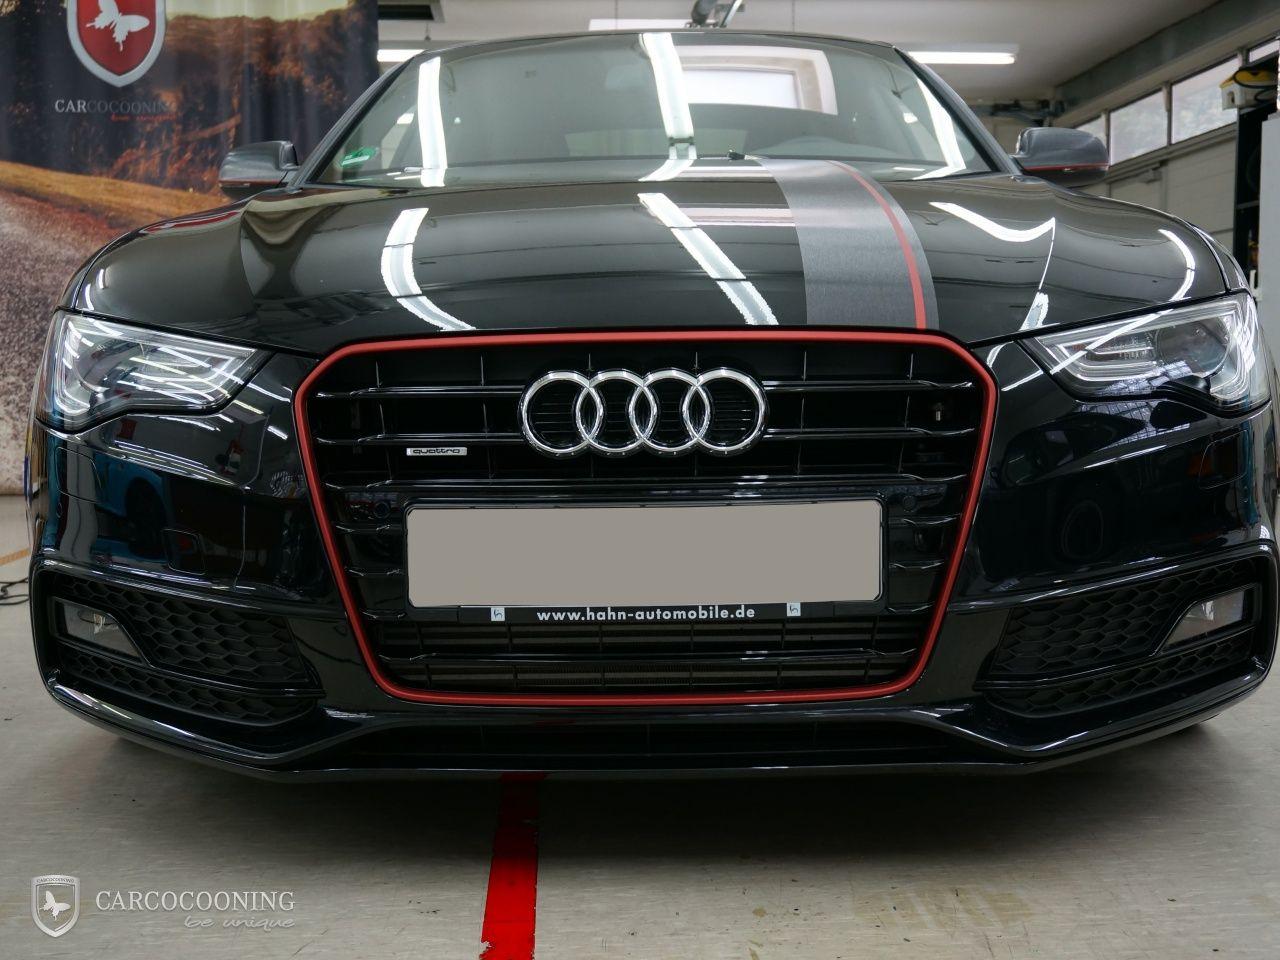 Audi A5 Bilder Seitenspiegel Heckspoiler Zierleisten Diffusor Sports Car Audi Design